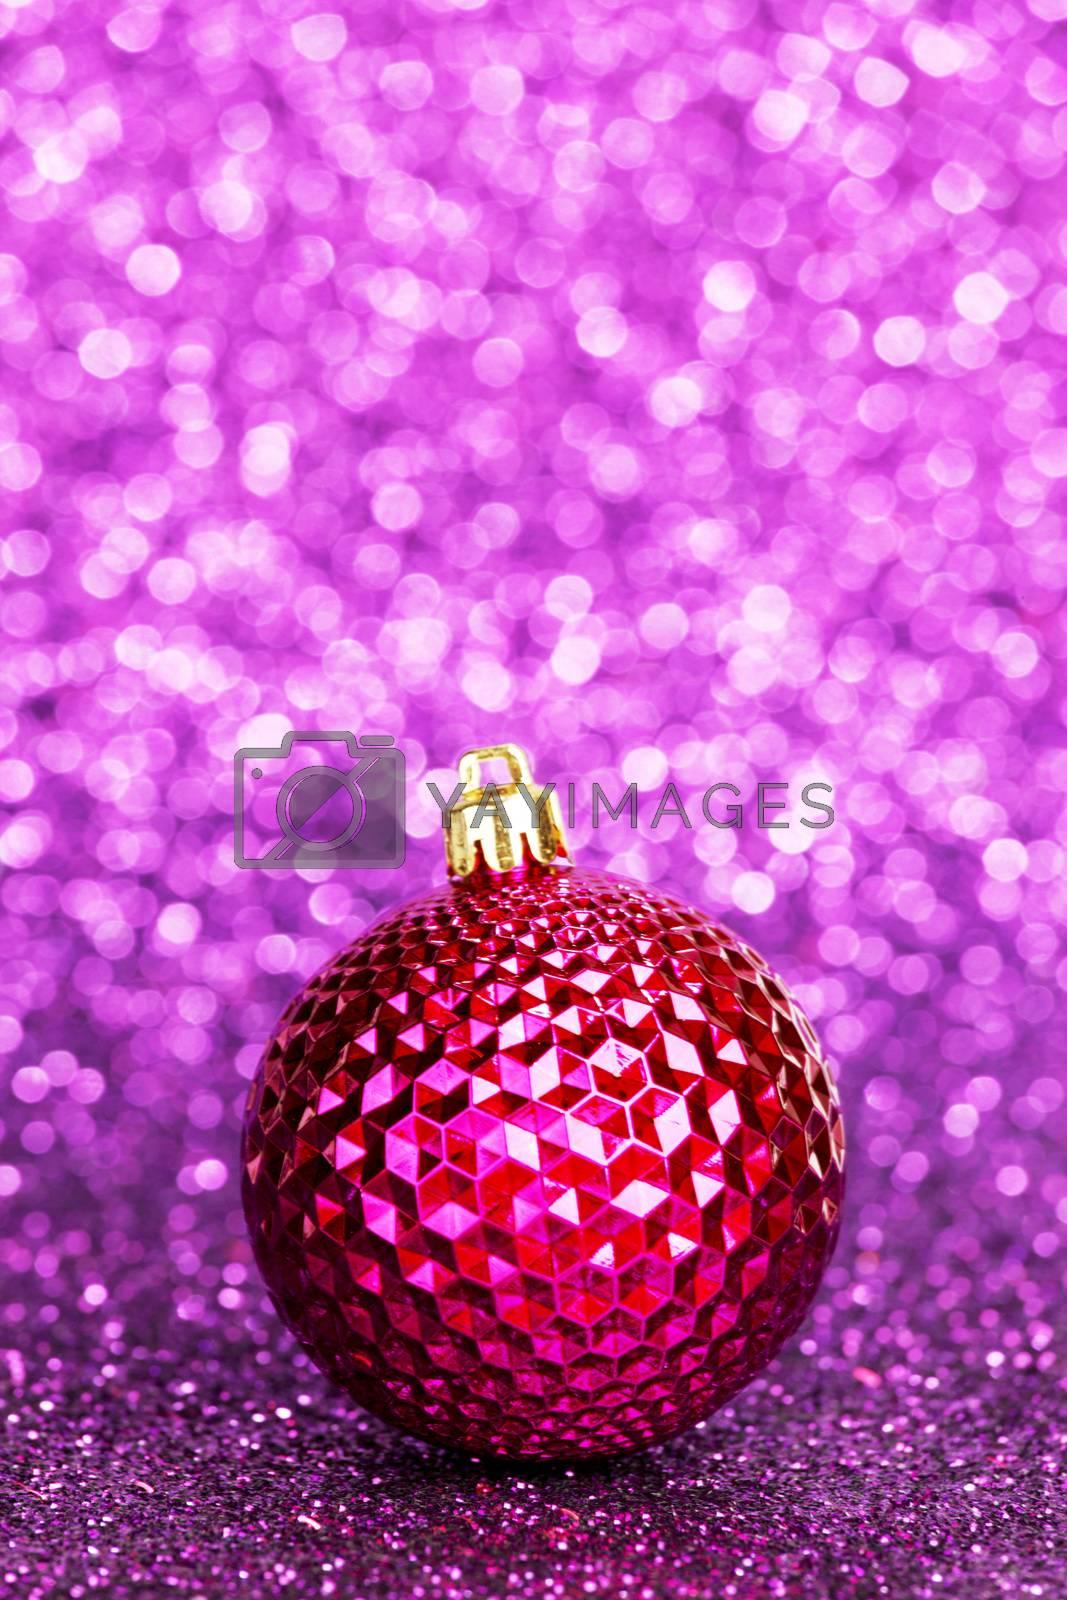 Royalty free image of Beautiful christmas ball by Yellowj